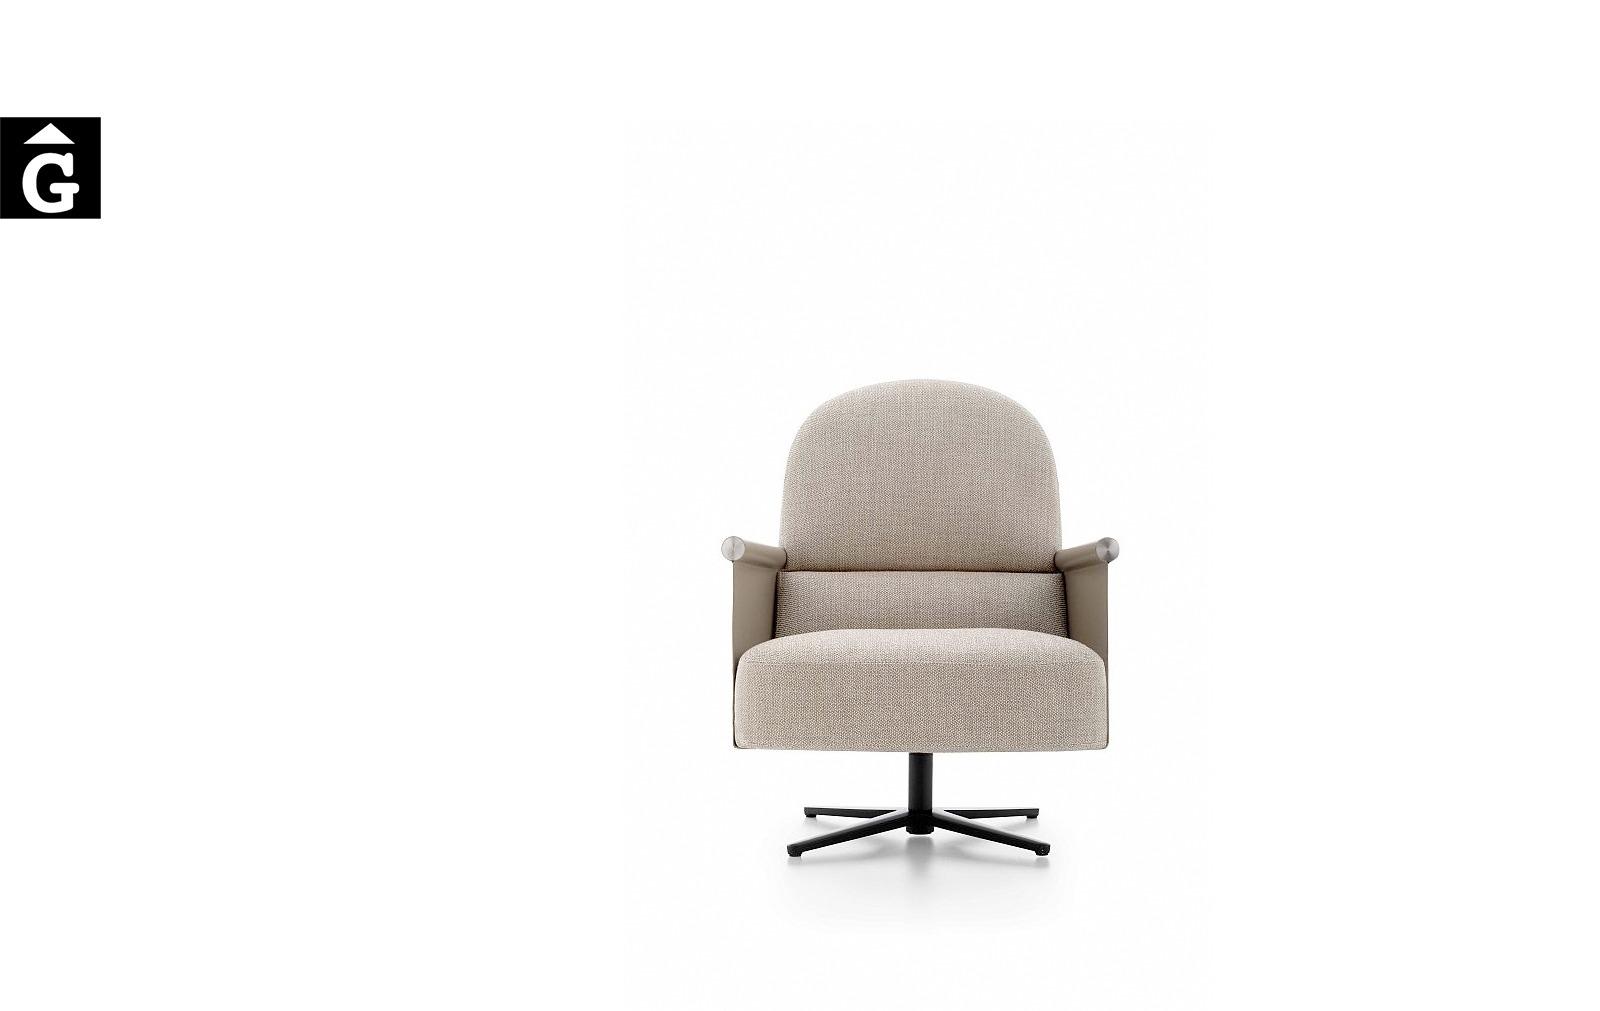 Butaca Beyl giratoria i molt elegant – Ditre Italia Sofas disseny i qualitat alta by mobles Gifreu